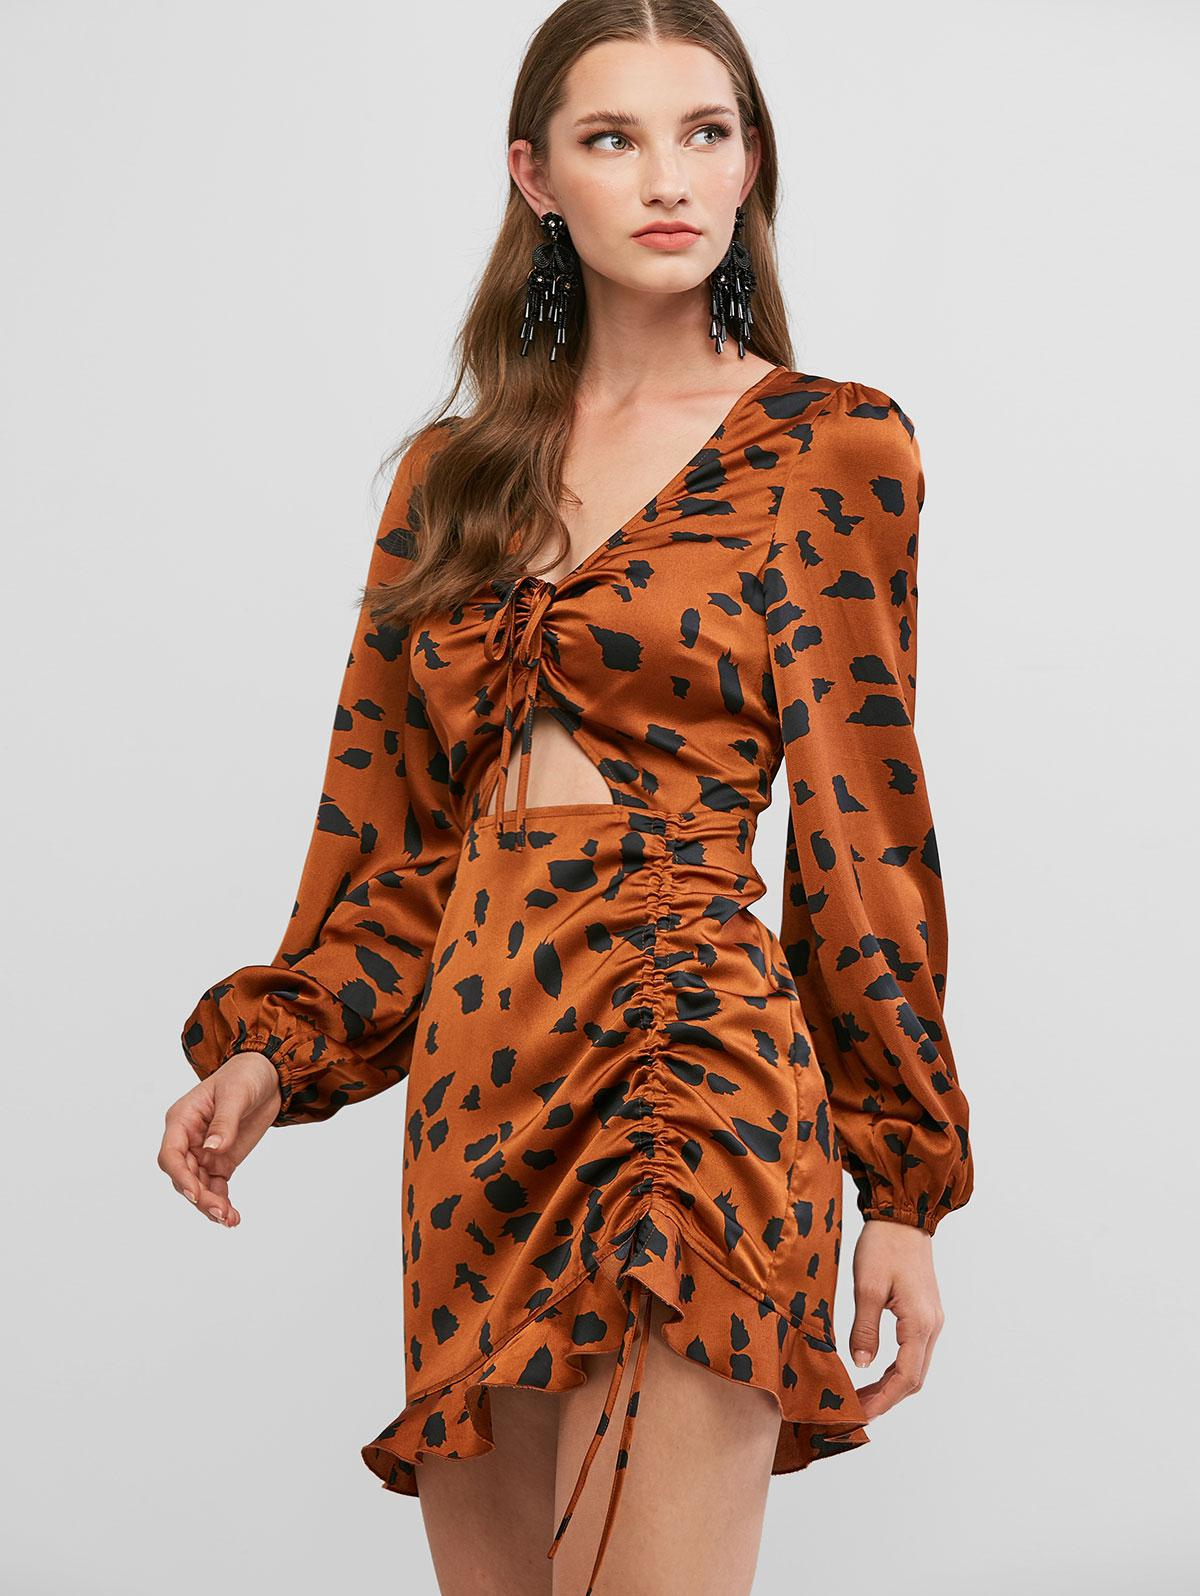 ZAFUL Ruffled Hem Printed Cinched Cut Out Mini Dress фото